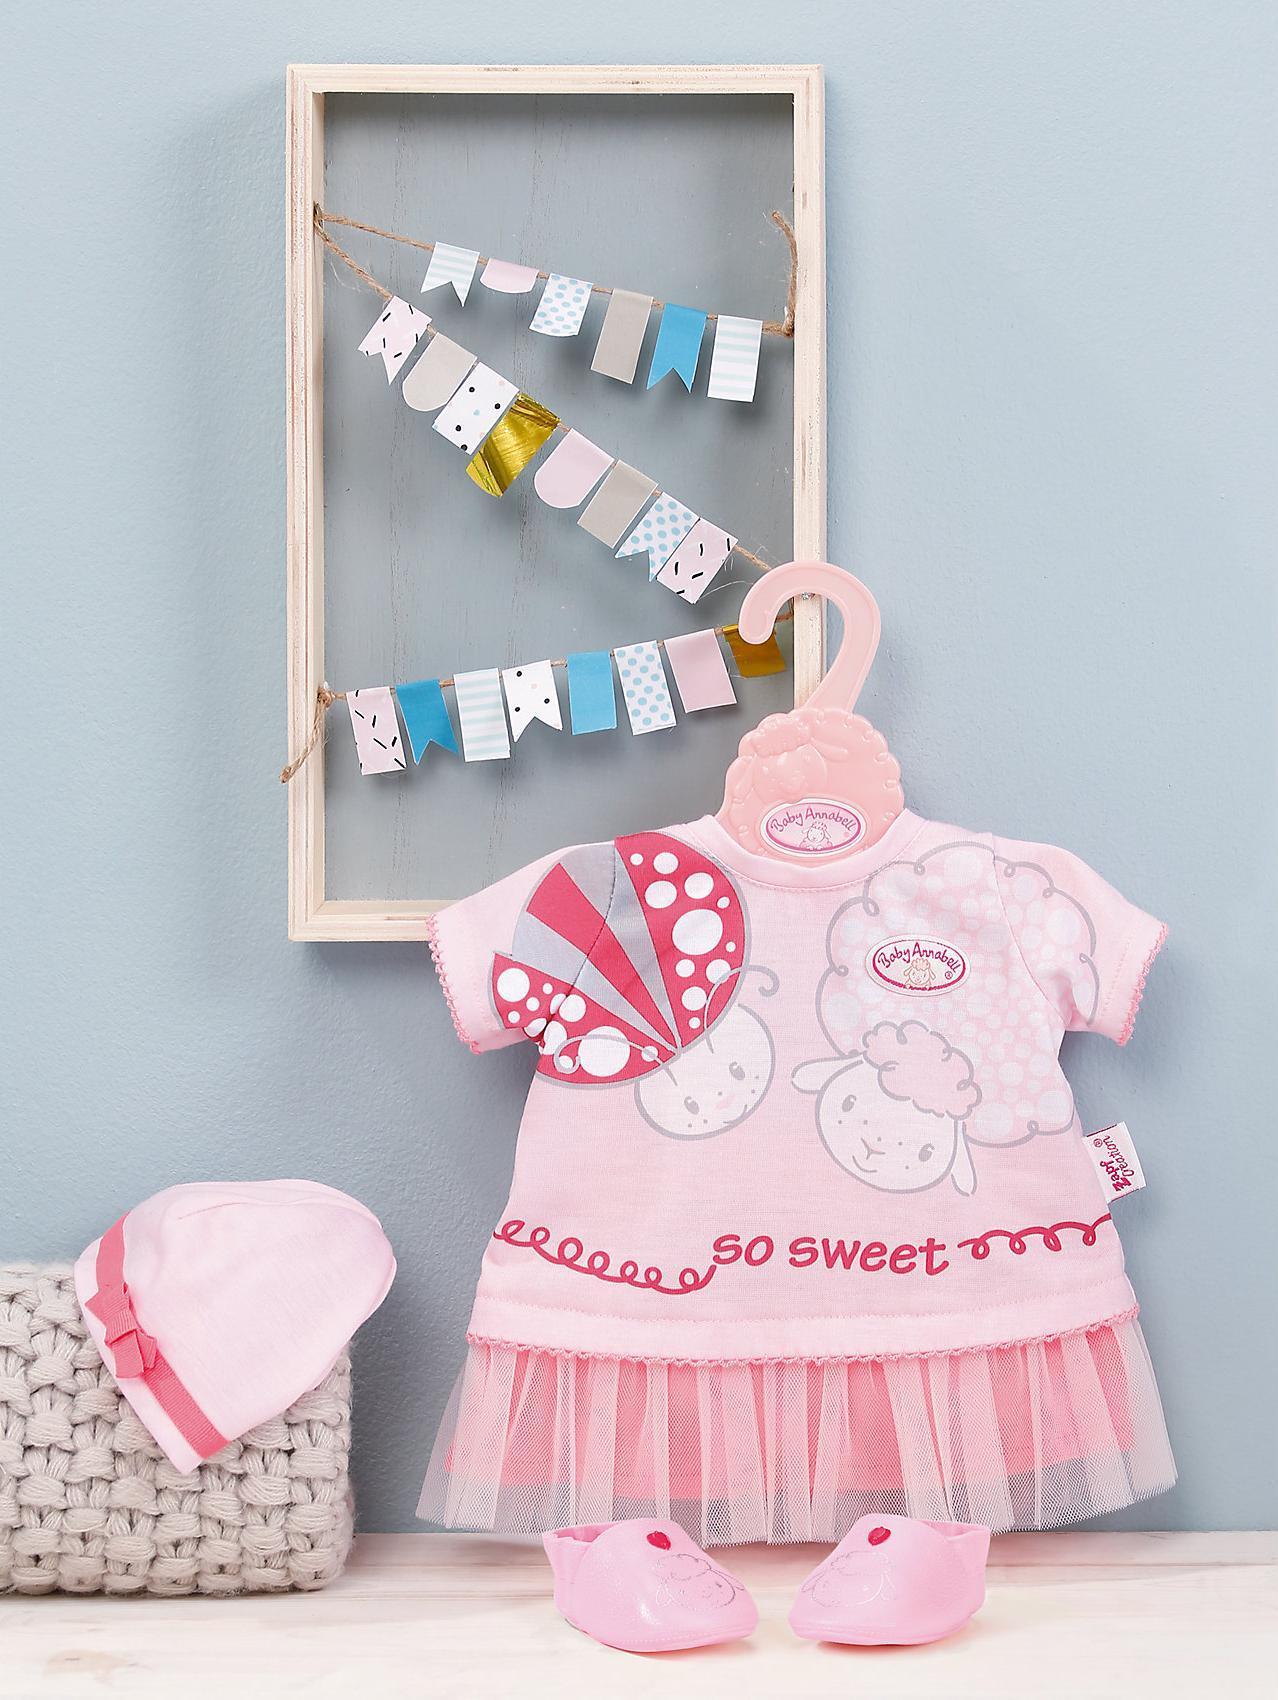 Одежда для теплых деньков, Baby Annabell 46 см